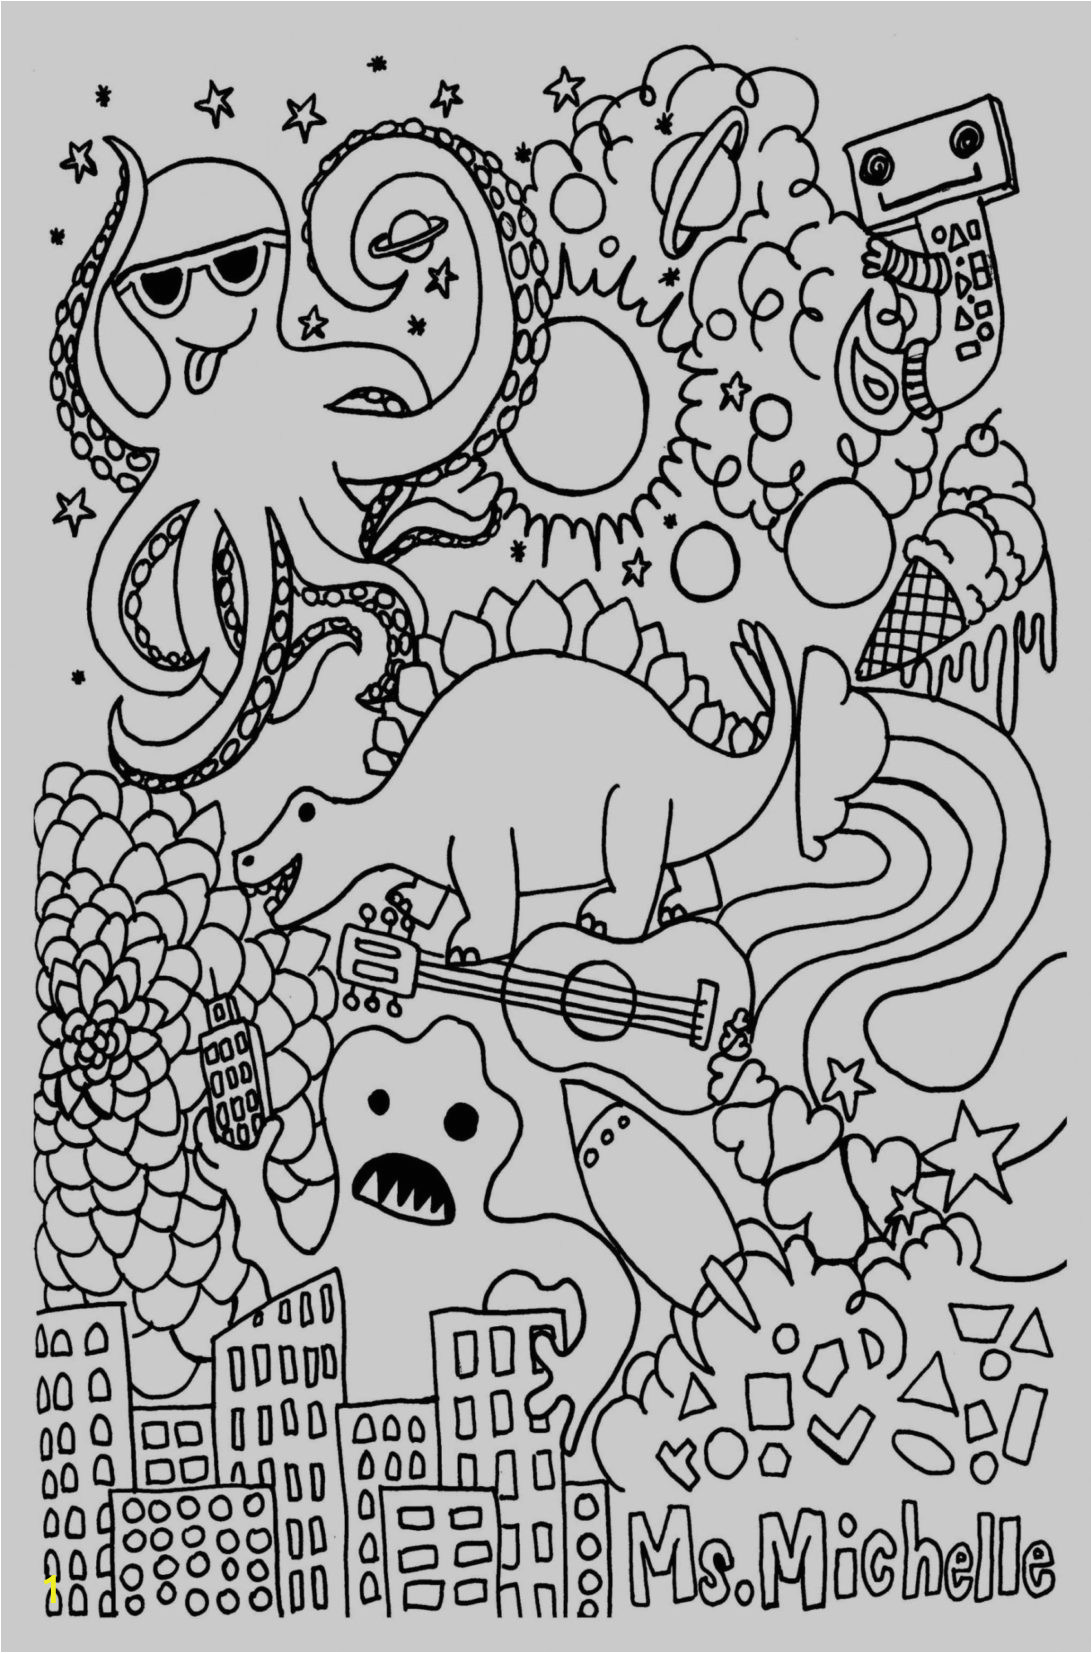 to print out coloring pages manga for adults snowman sheet horror lion adult sea life mermaid princess clown preschoolers sports gel pen sets anna paw patrol kids printable mandala